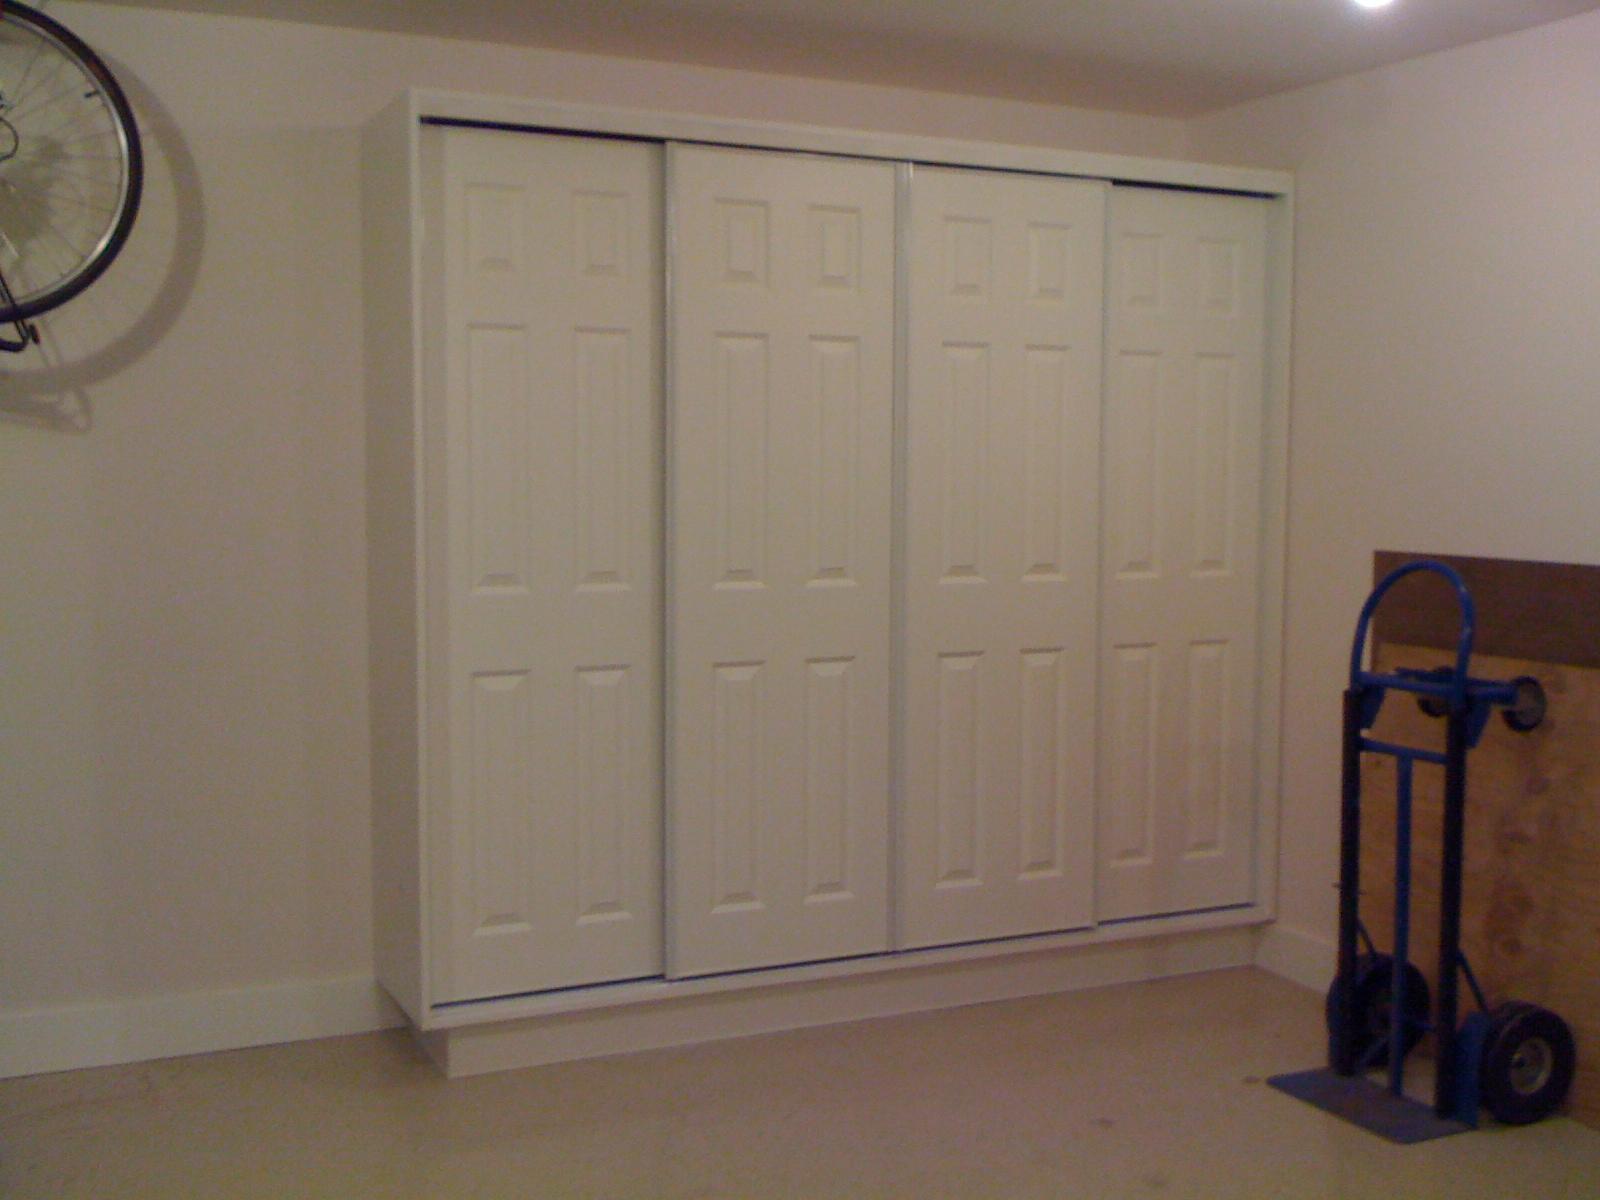 Garage Storage Cabinet | Retro-Tech Construction LLC